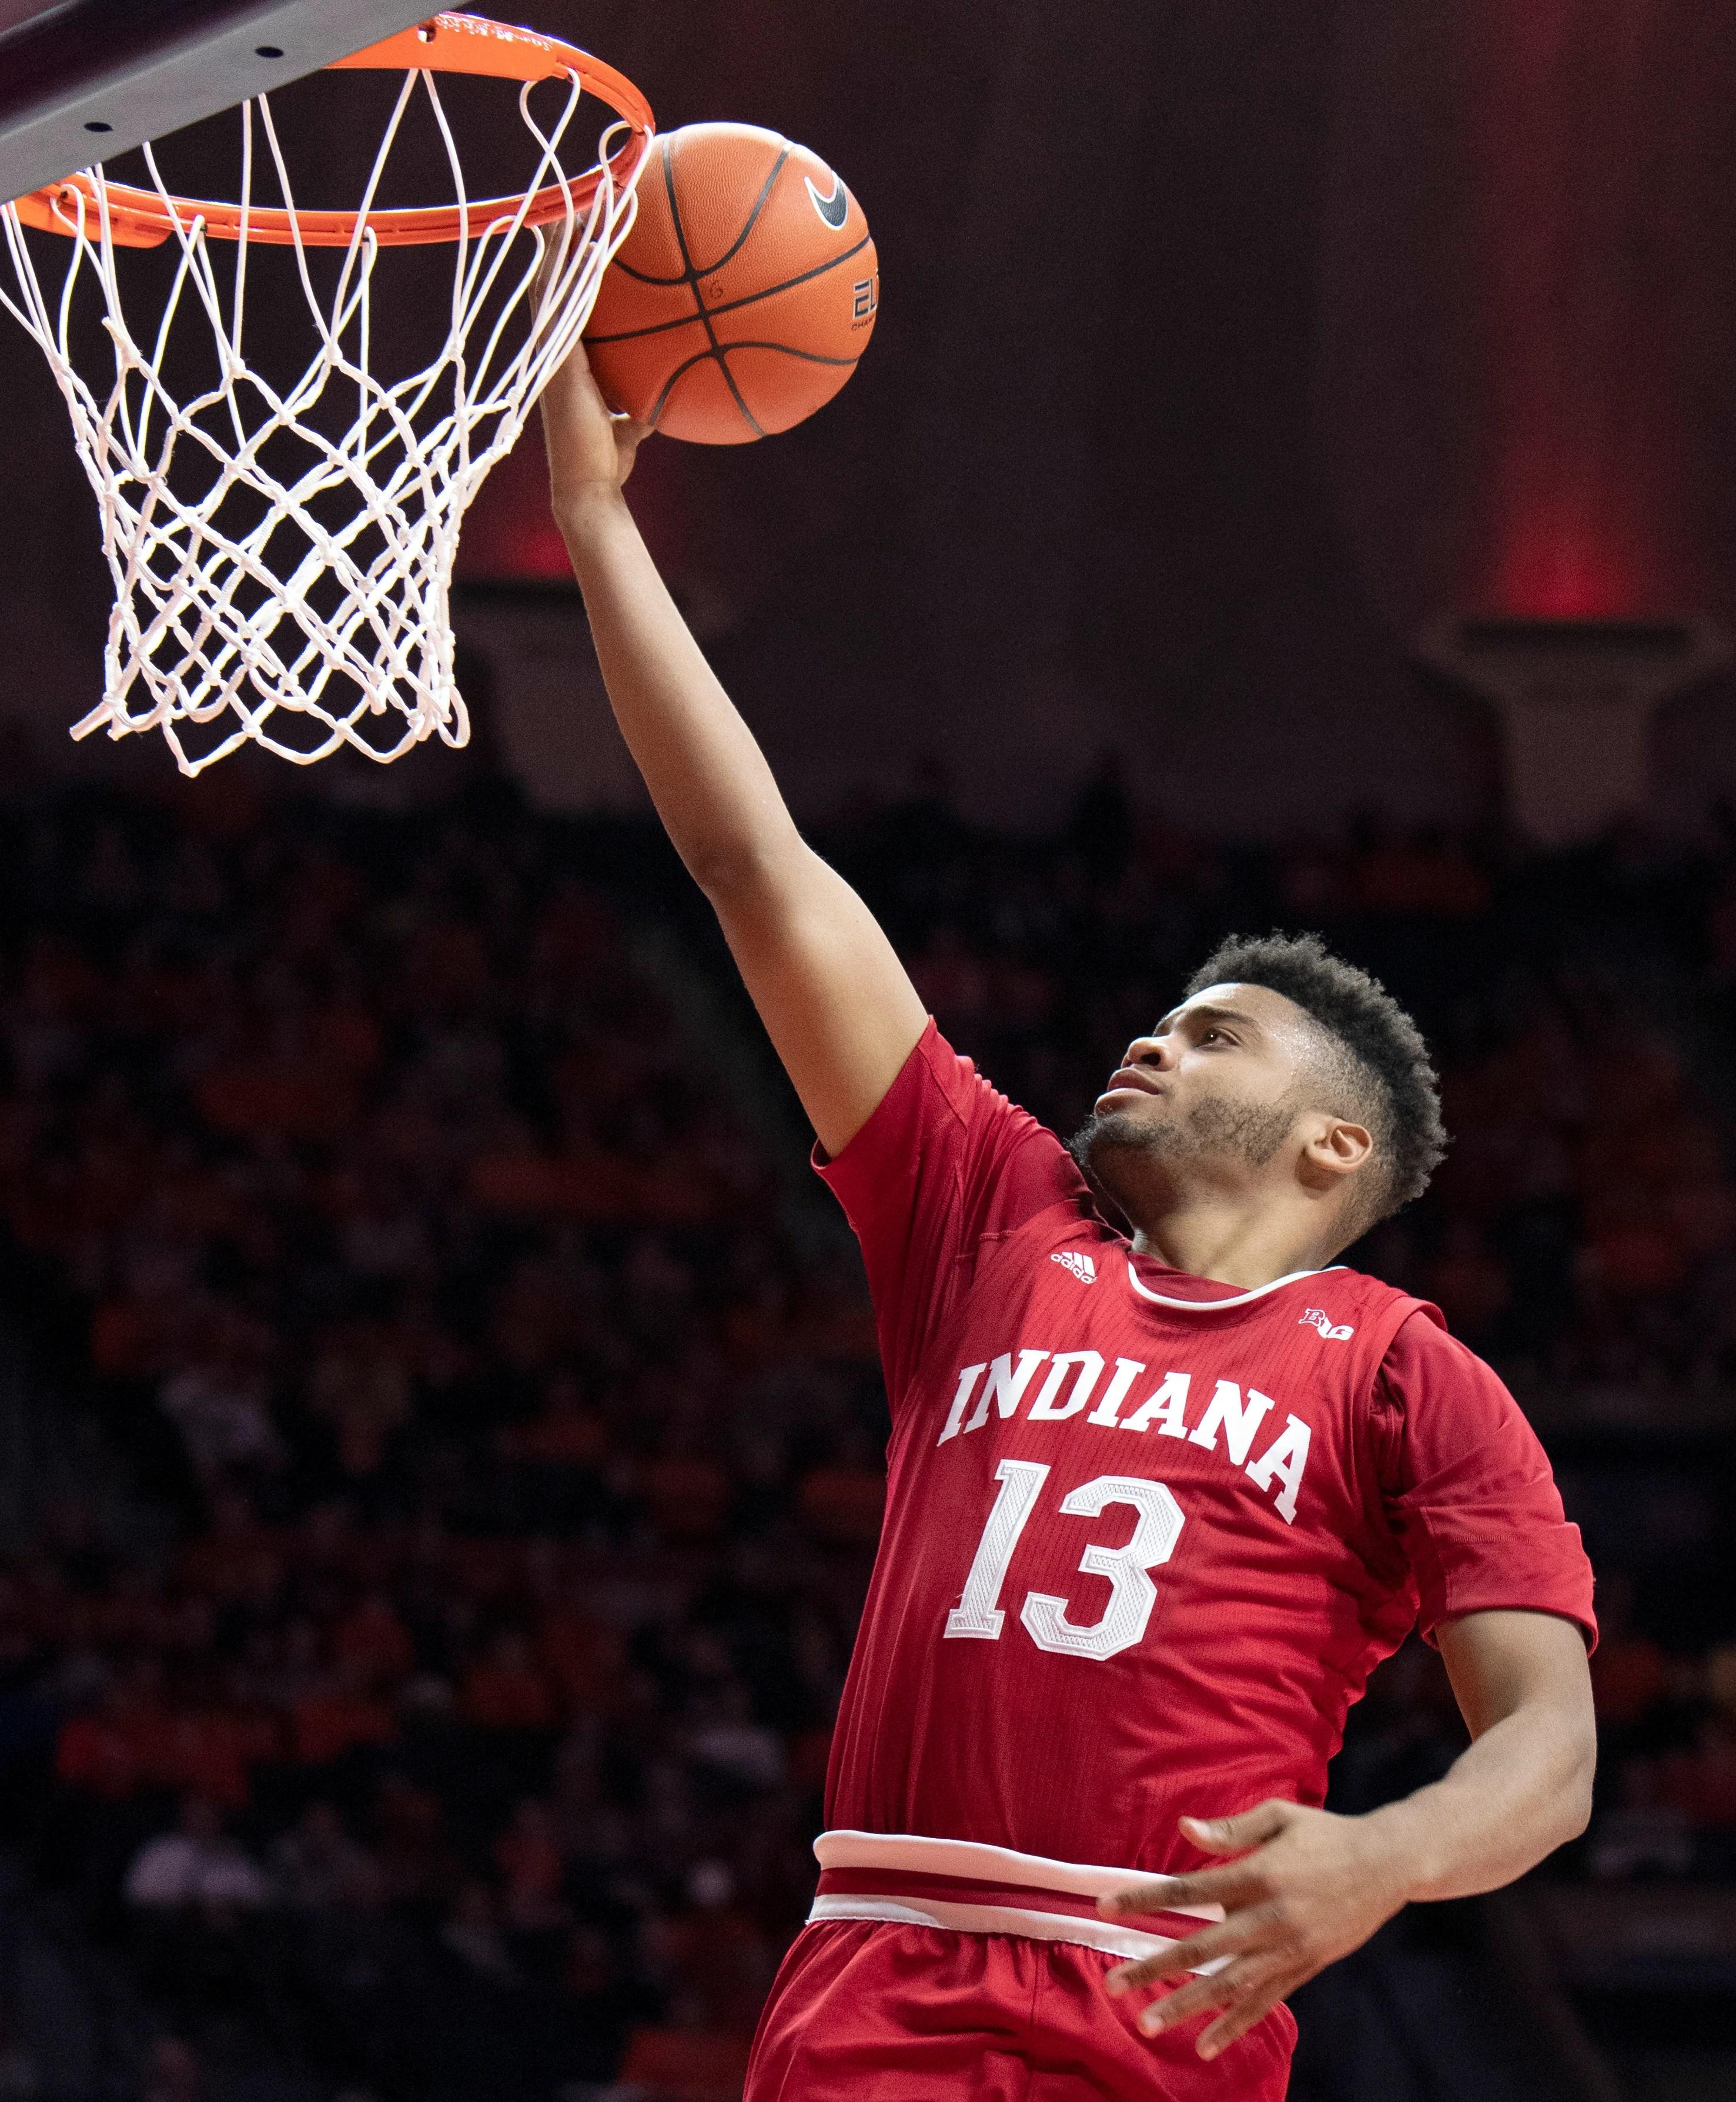 Indiana Illinois Basketball_1552017778814